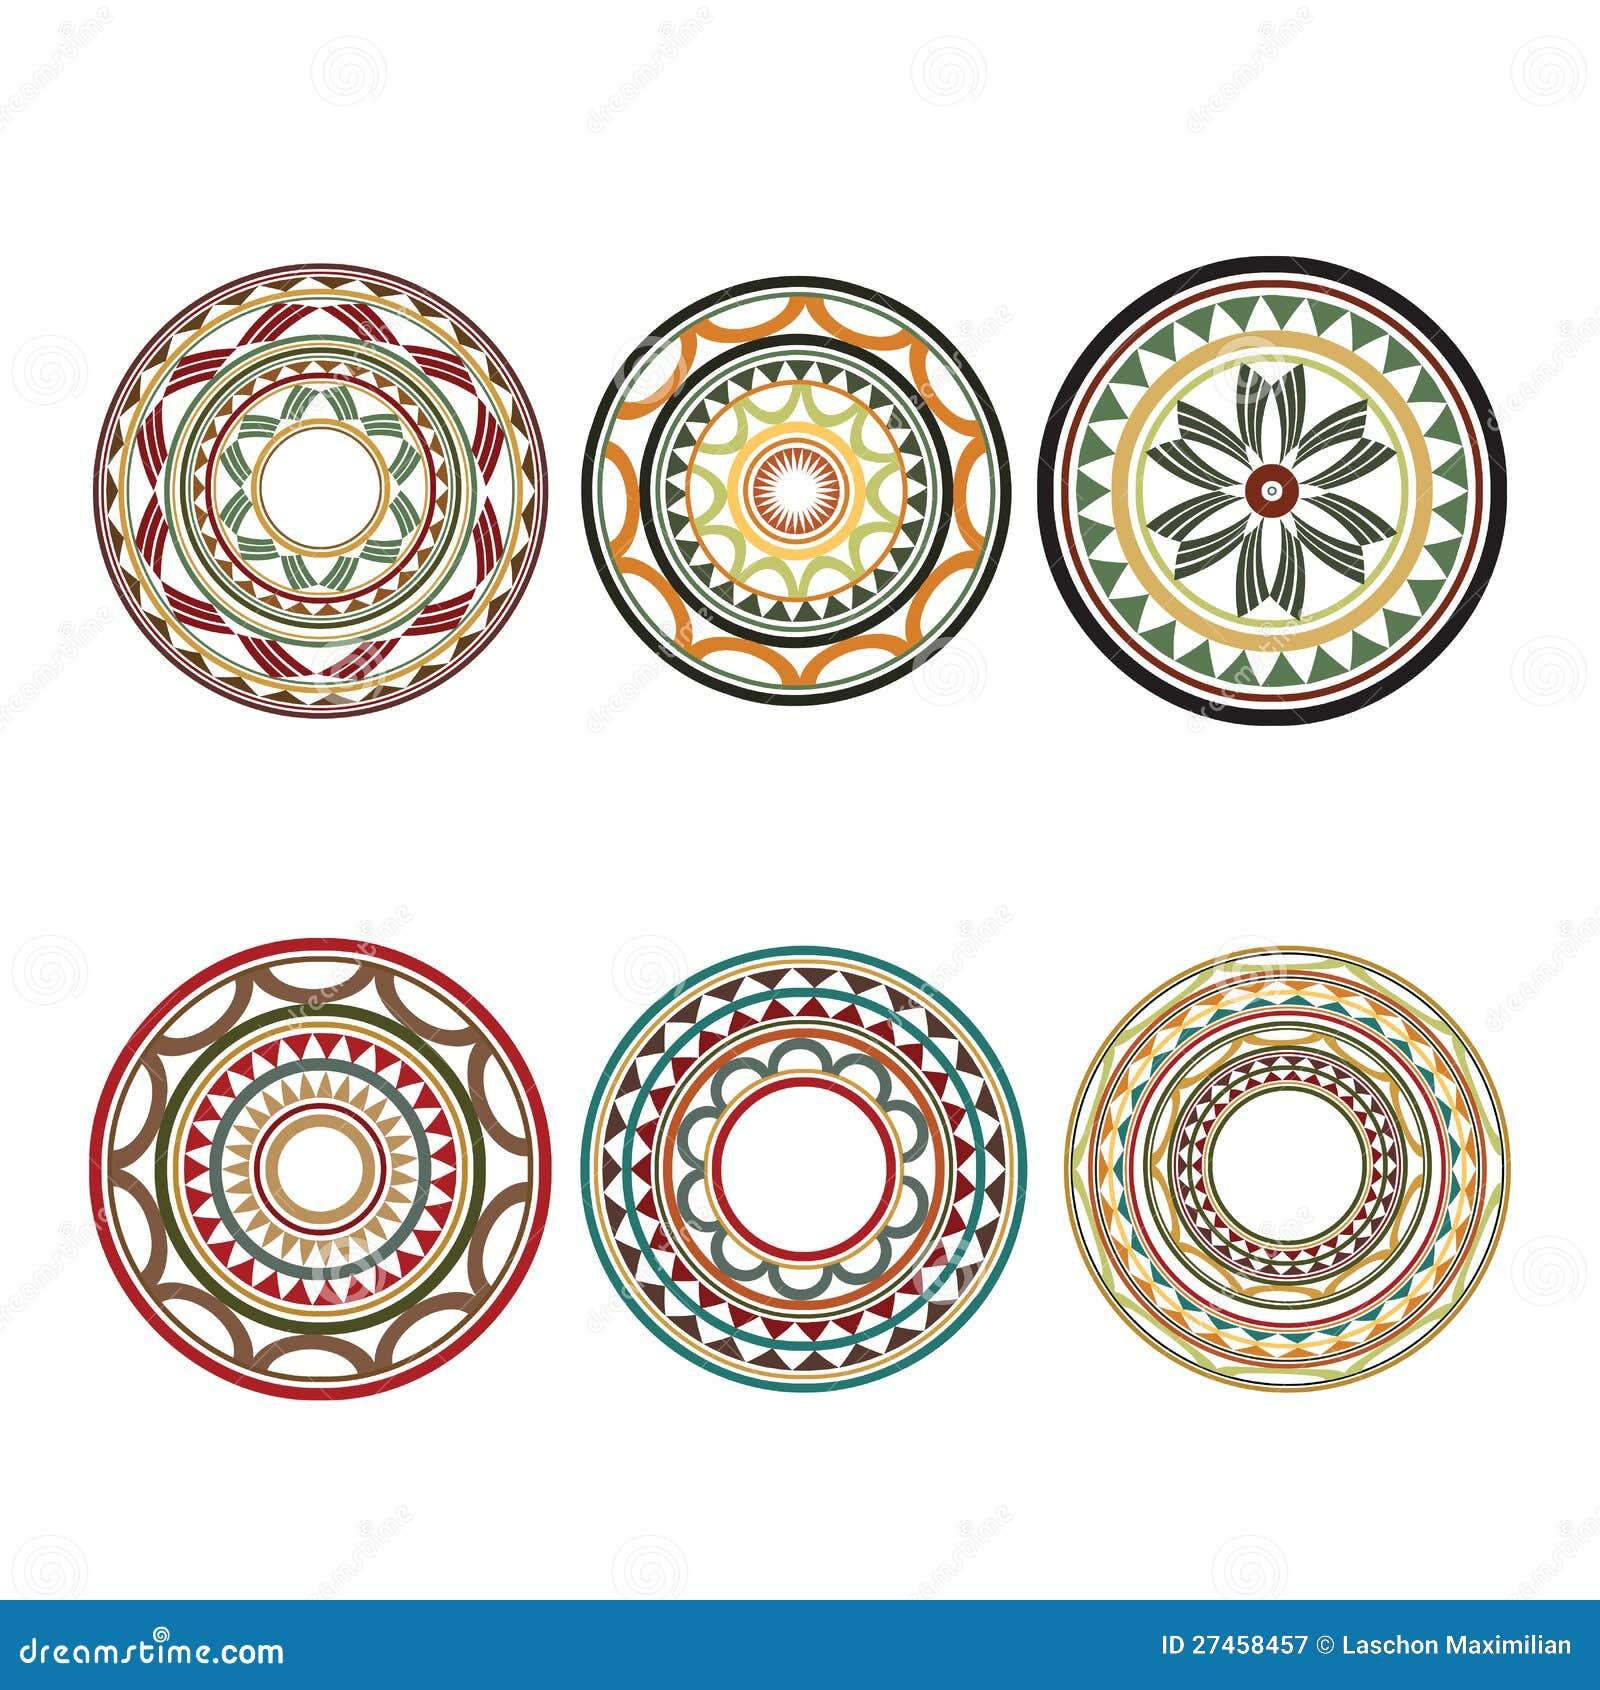 maori polynesian style tattoos designs royalty free stock photography image 27458457. Black Bedroom Furniture Sets. Home Design Ideas